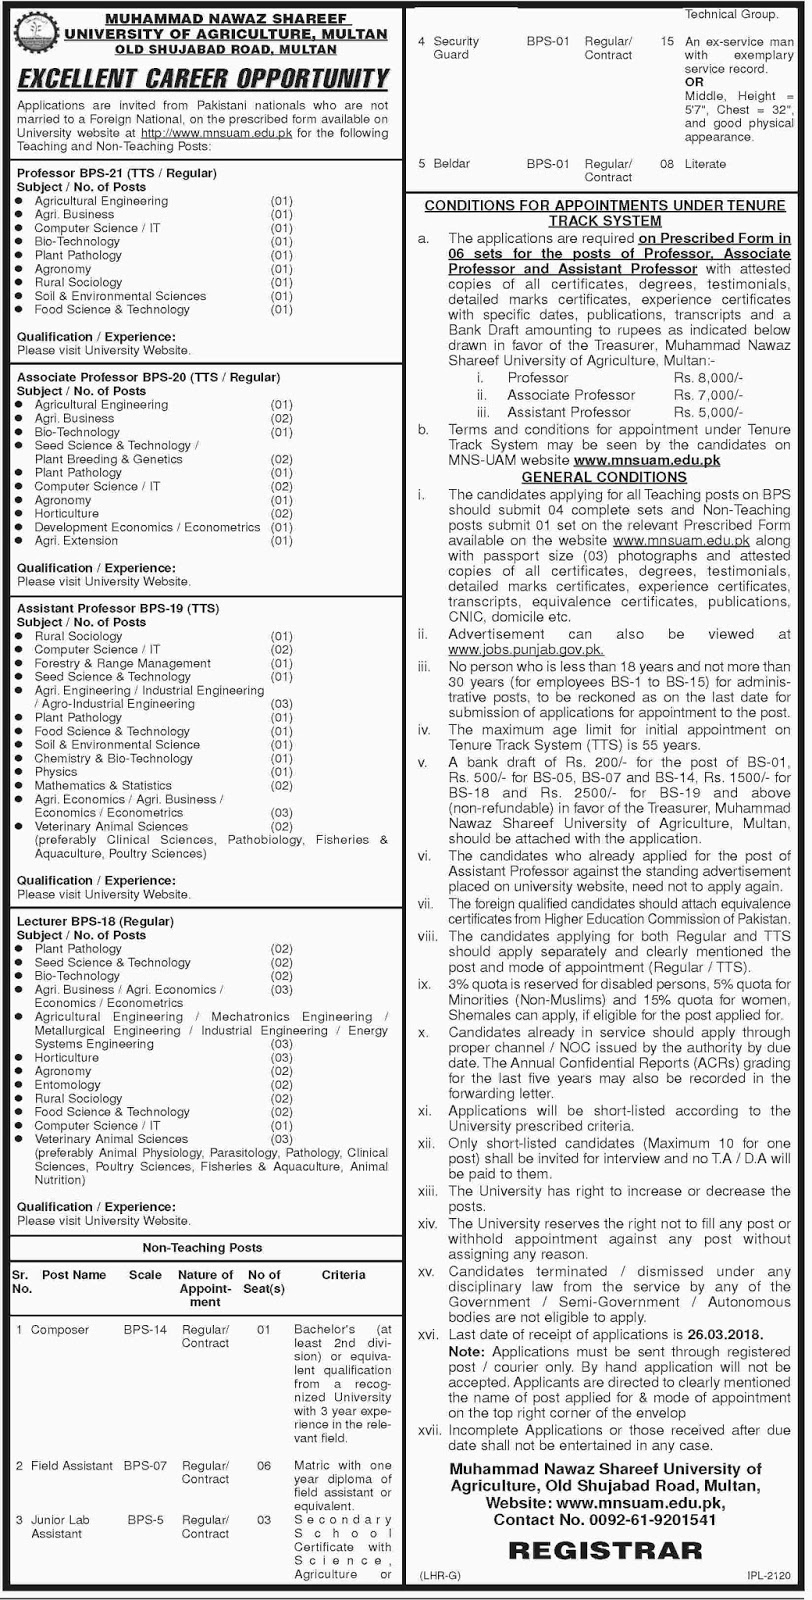 Jobs In Muhammad Nawaz Sharif University Of Agriculture Feb 2018